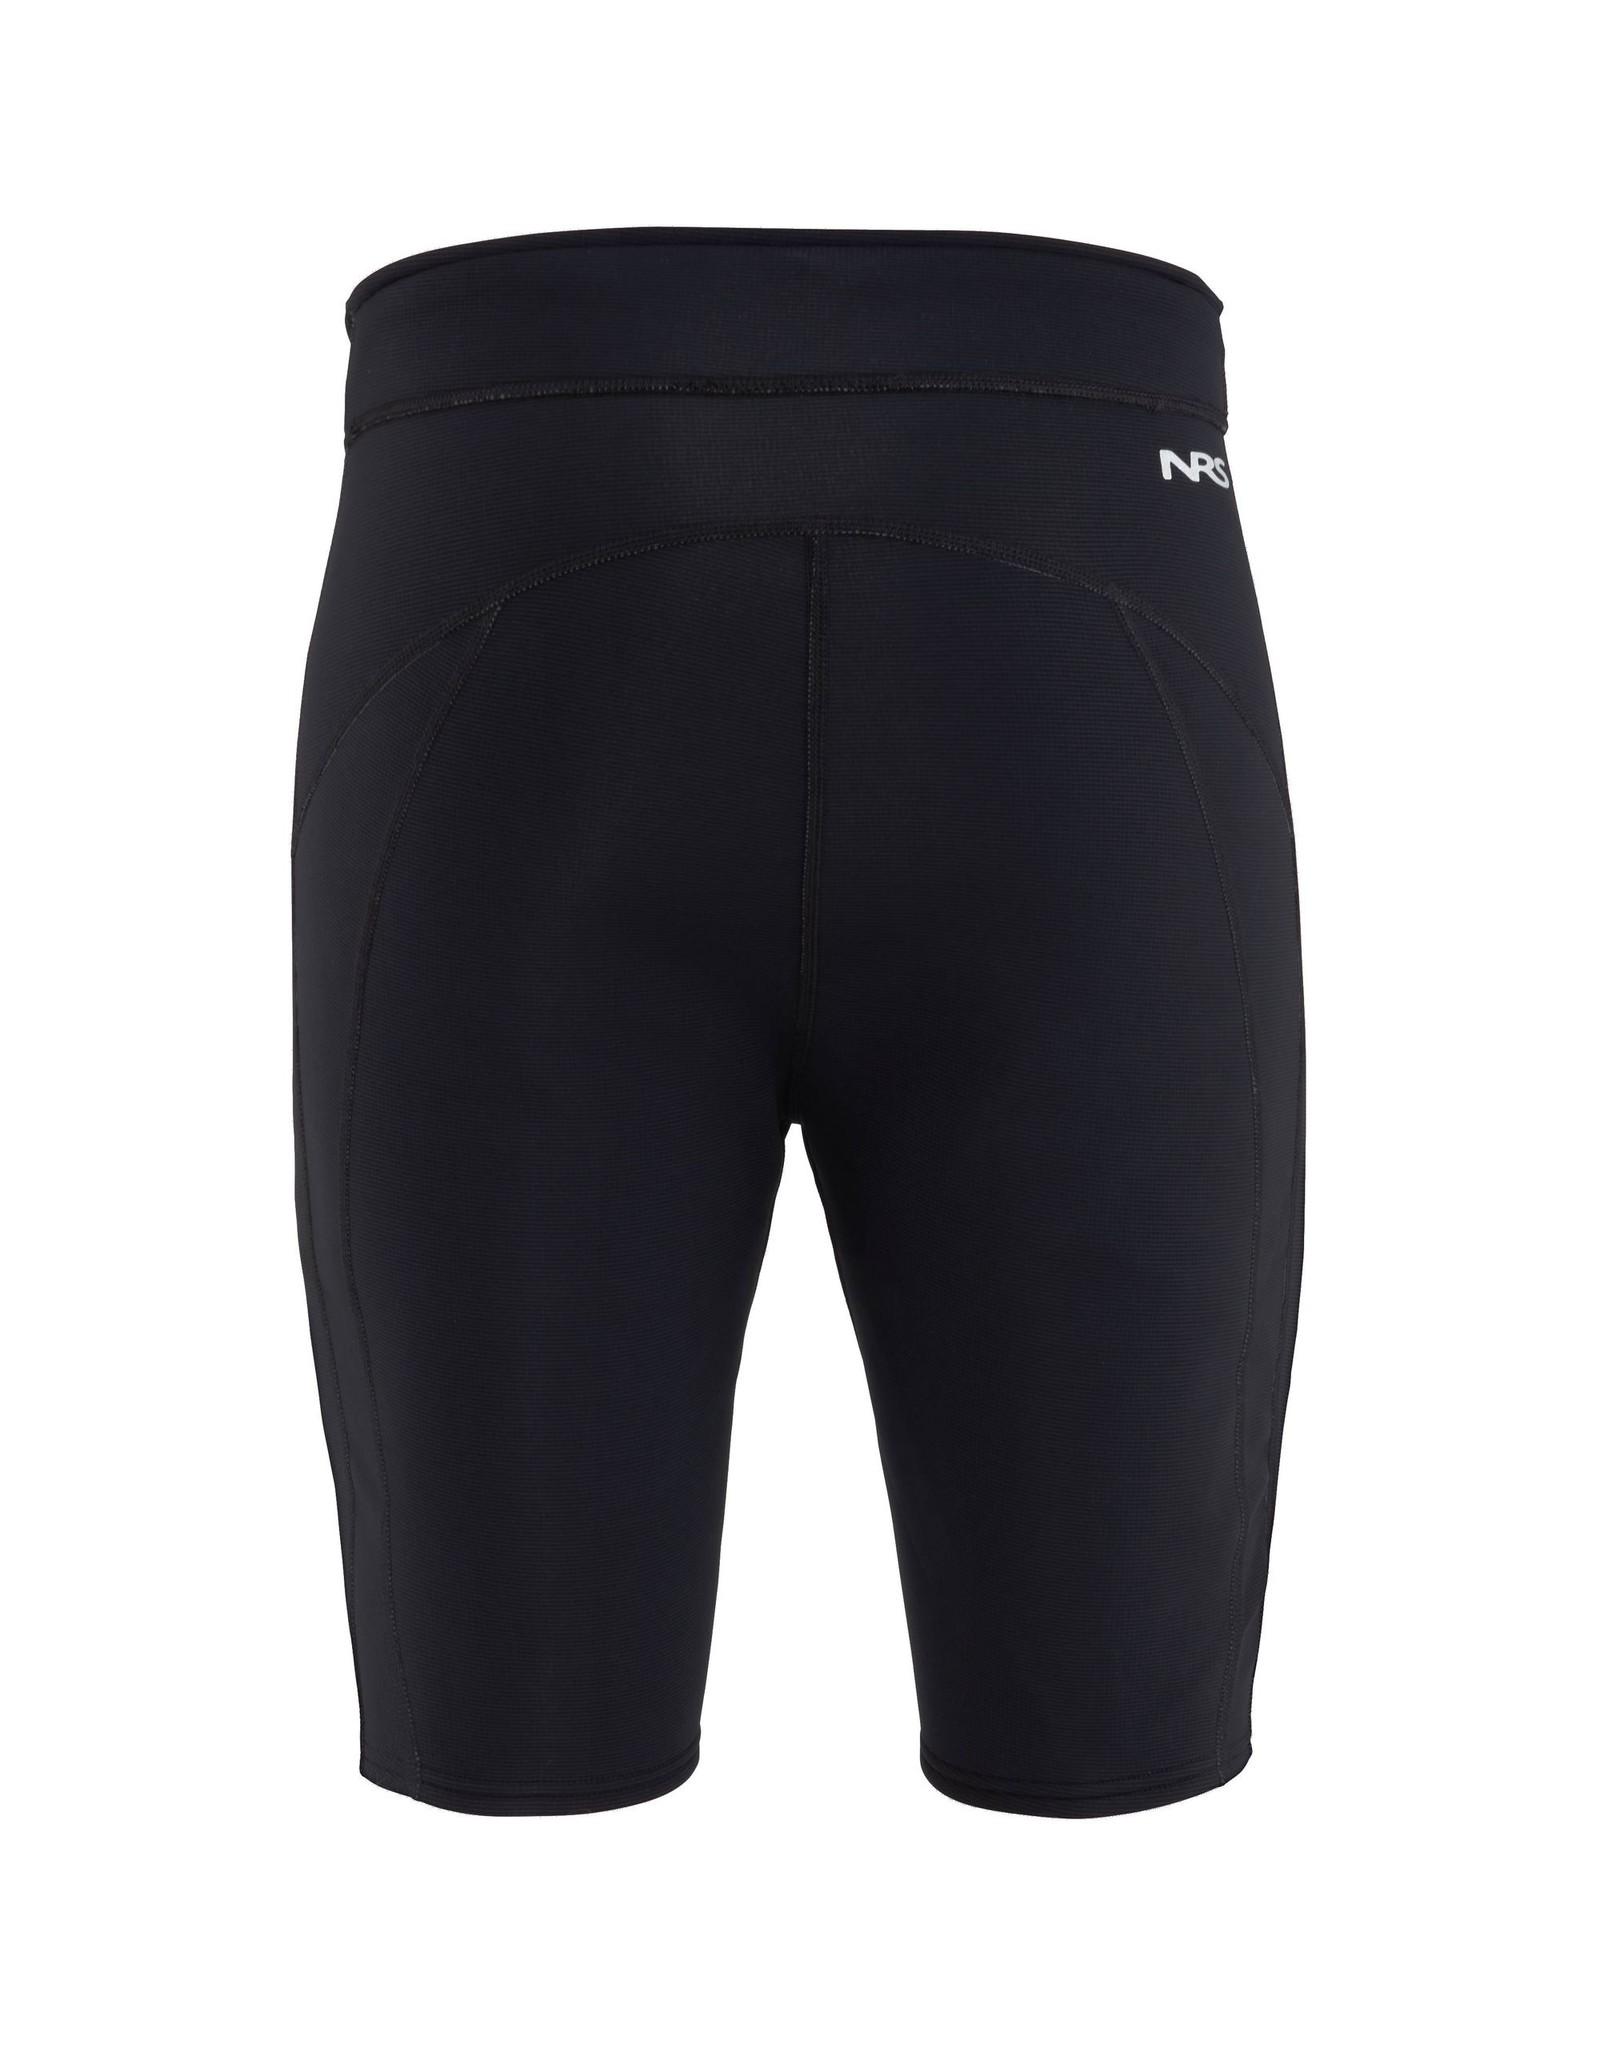 NRS NRS HydroSkin .5 Shorts- Mens